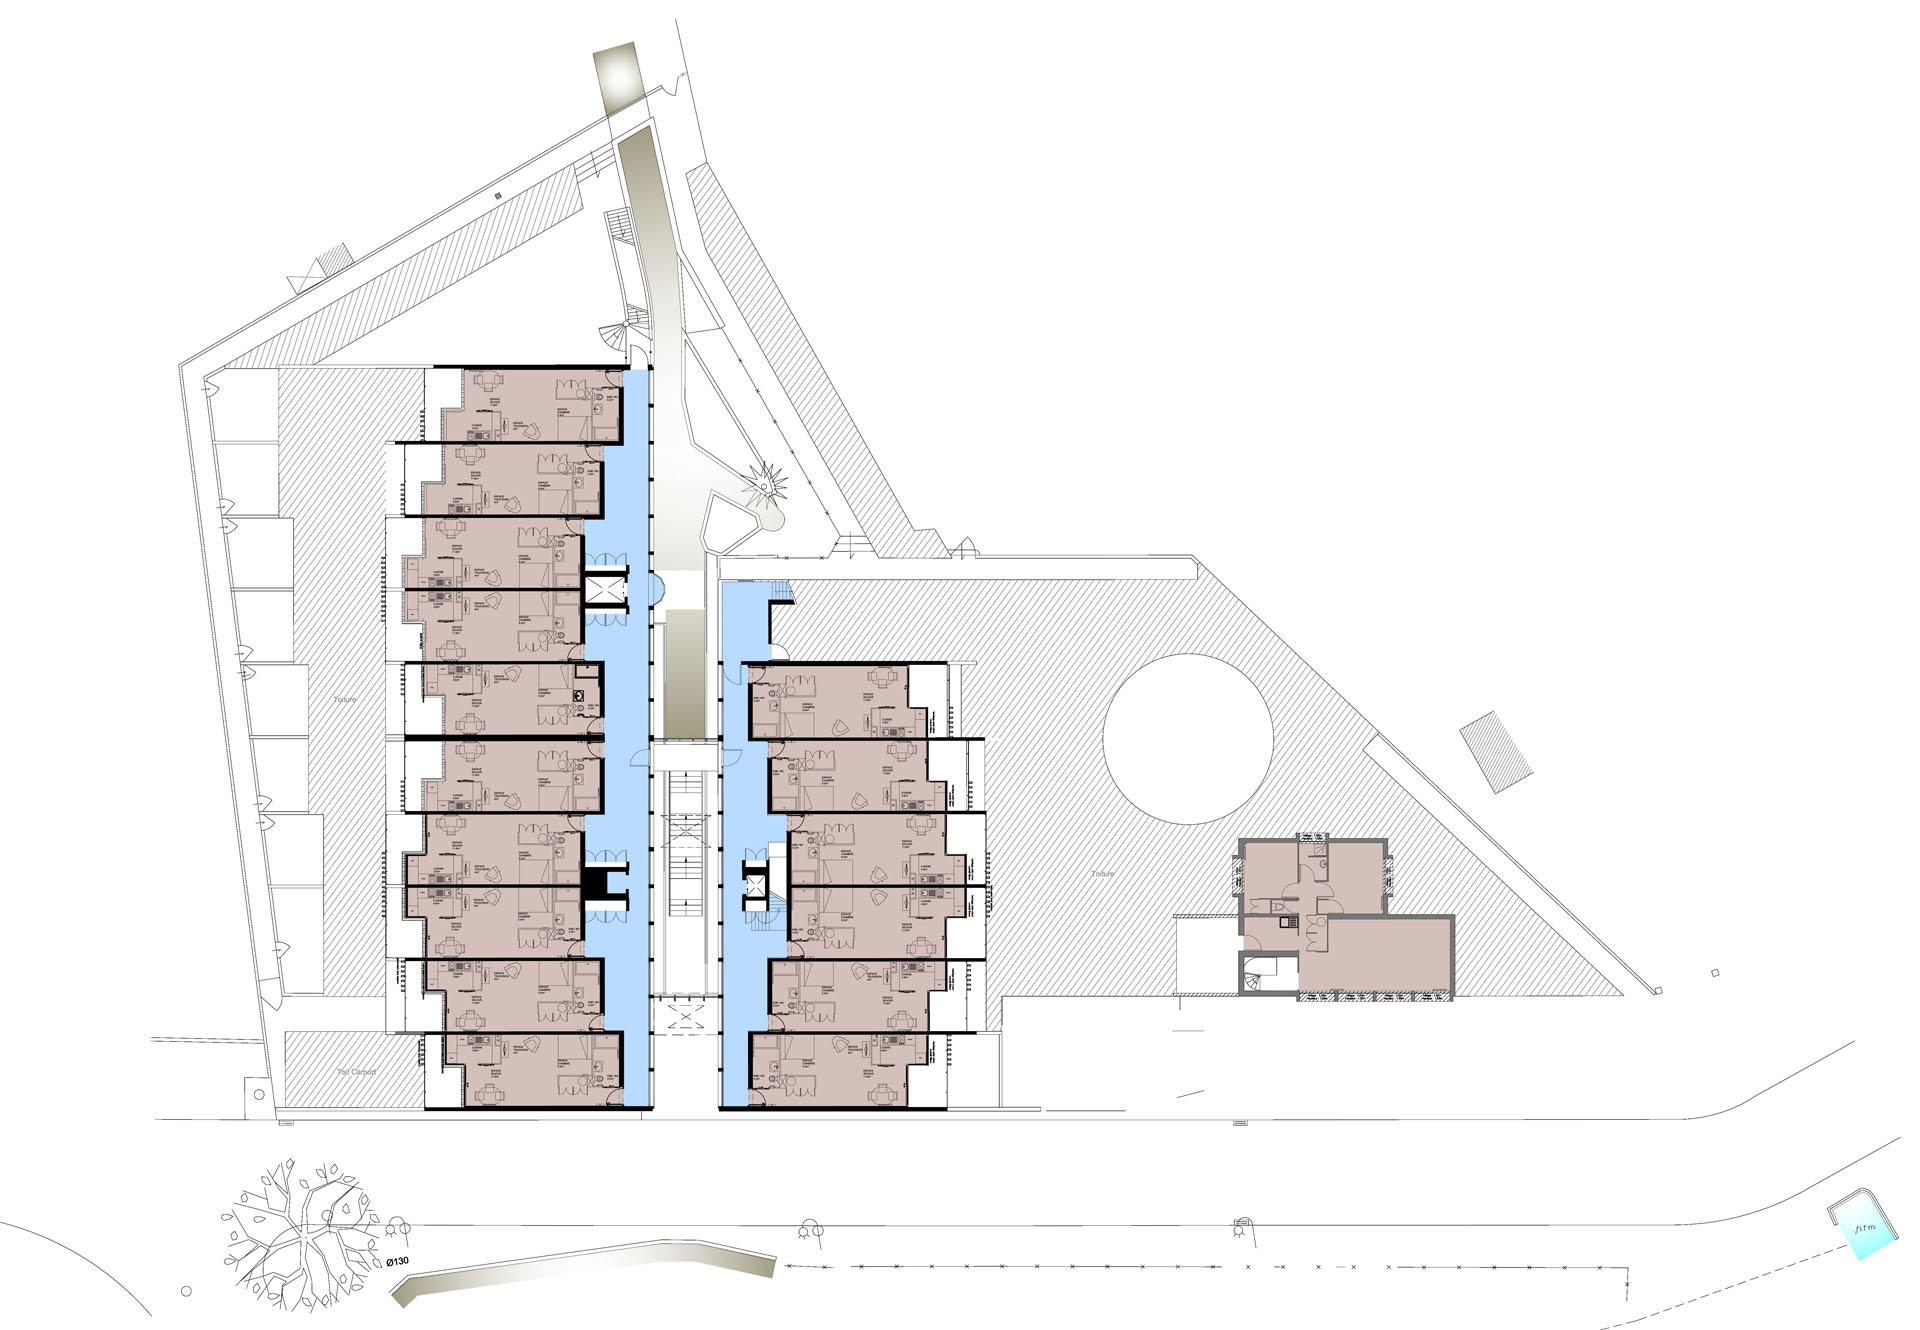 Plan du niveau R1 - EHPA La Teste